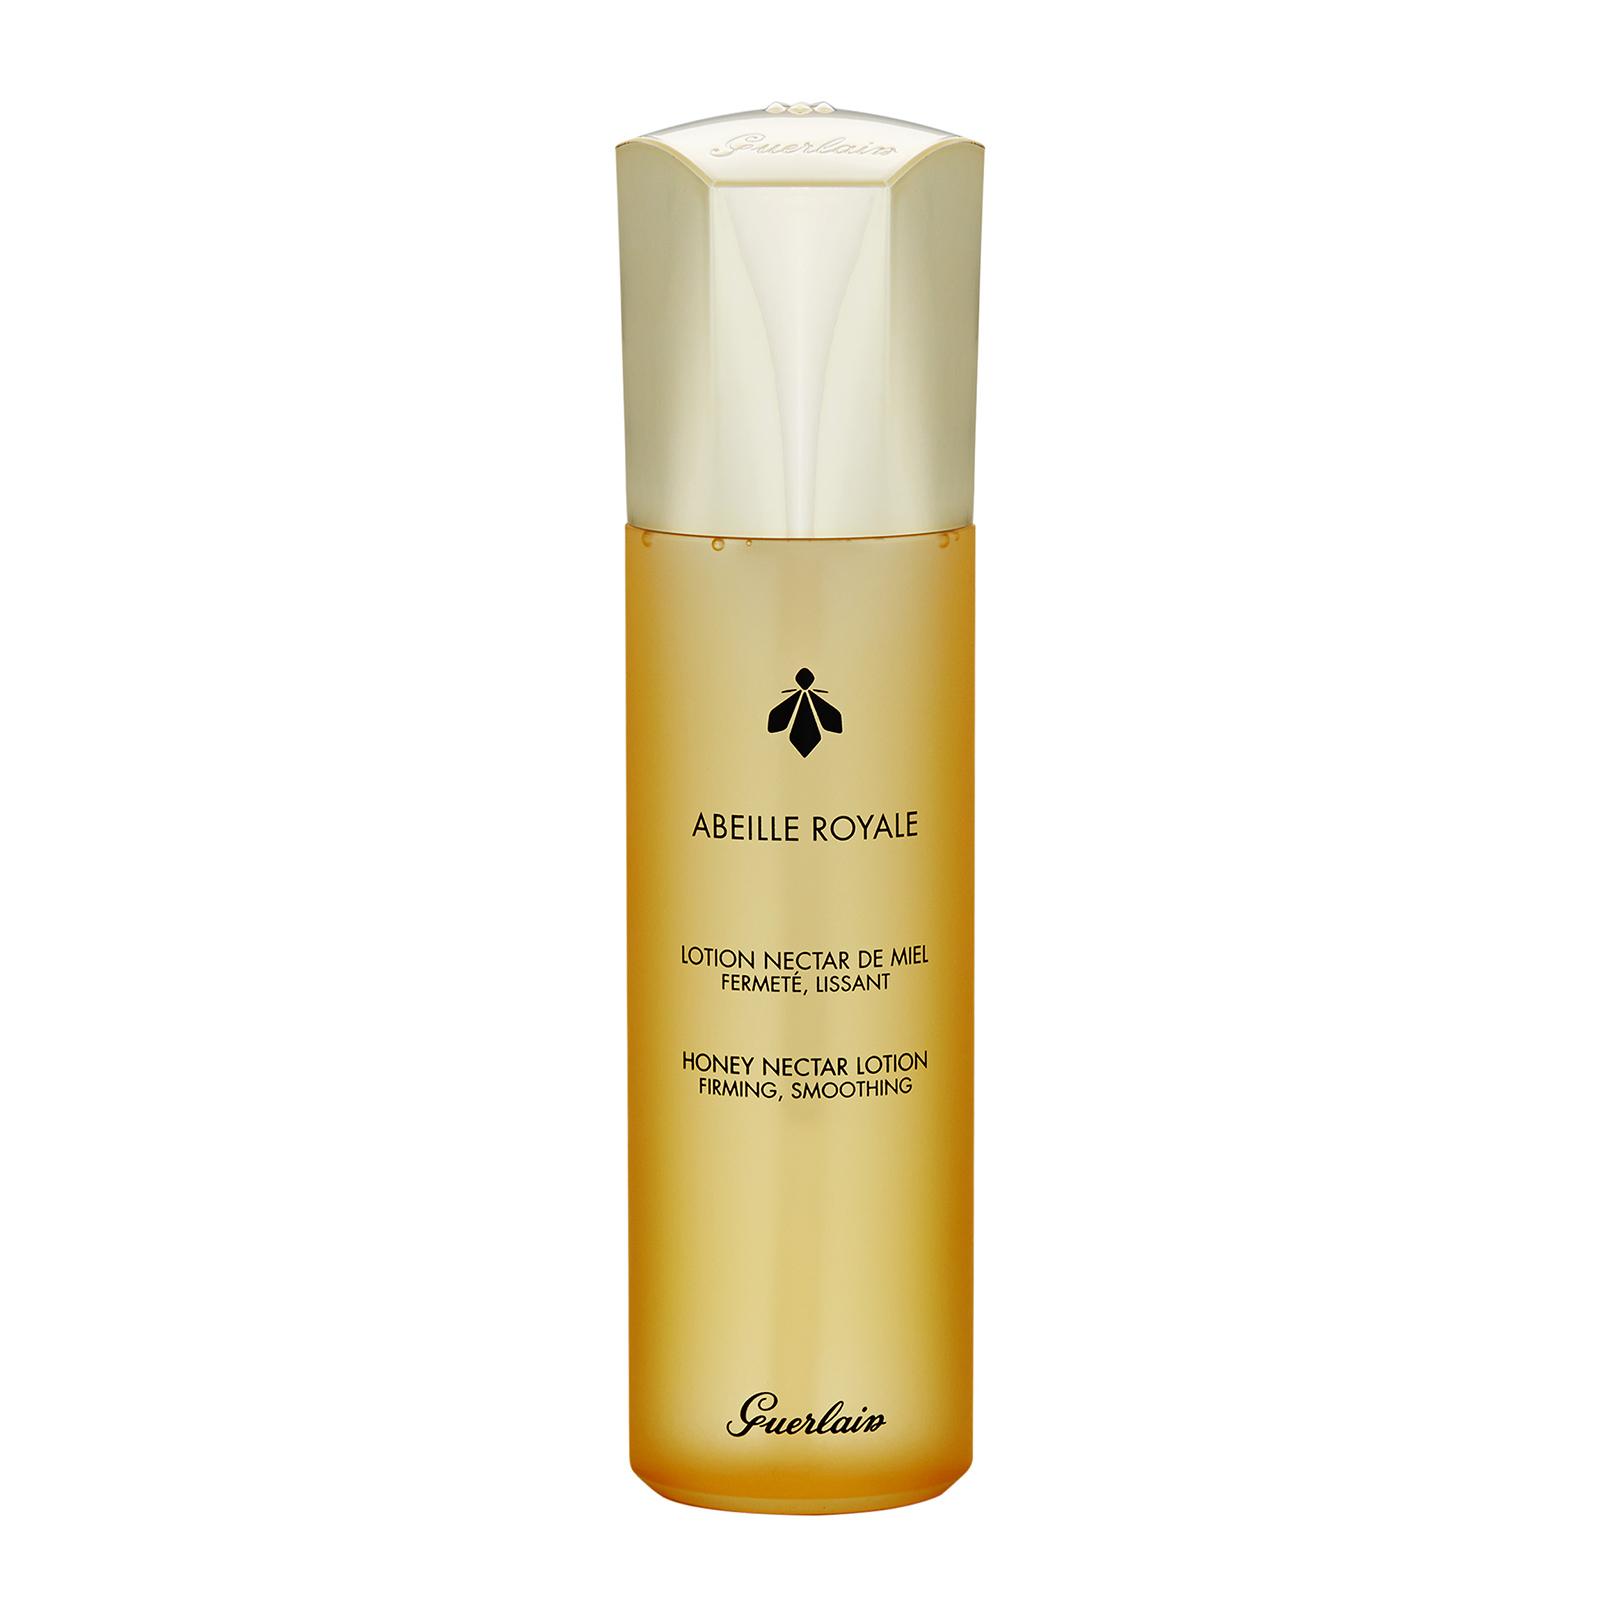 Guerlain Abeille Royale  Honey Nectar Lotion 5oz, 150ml from Cosme-De.com